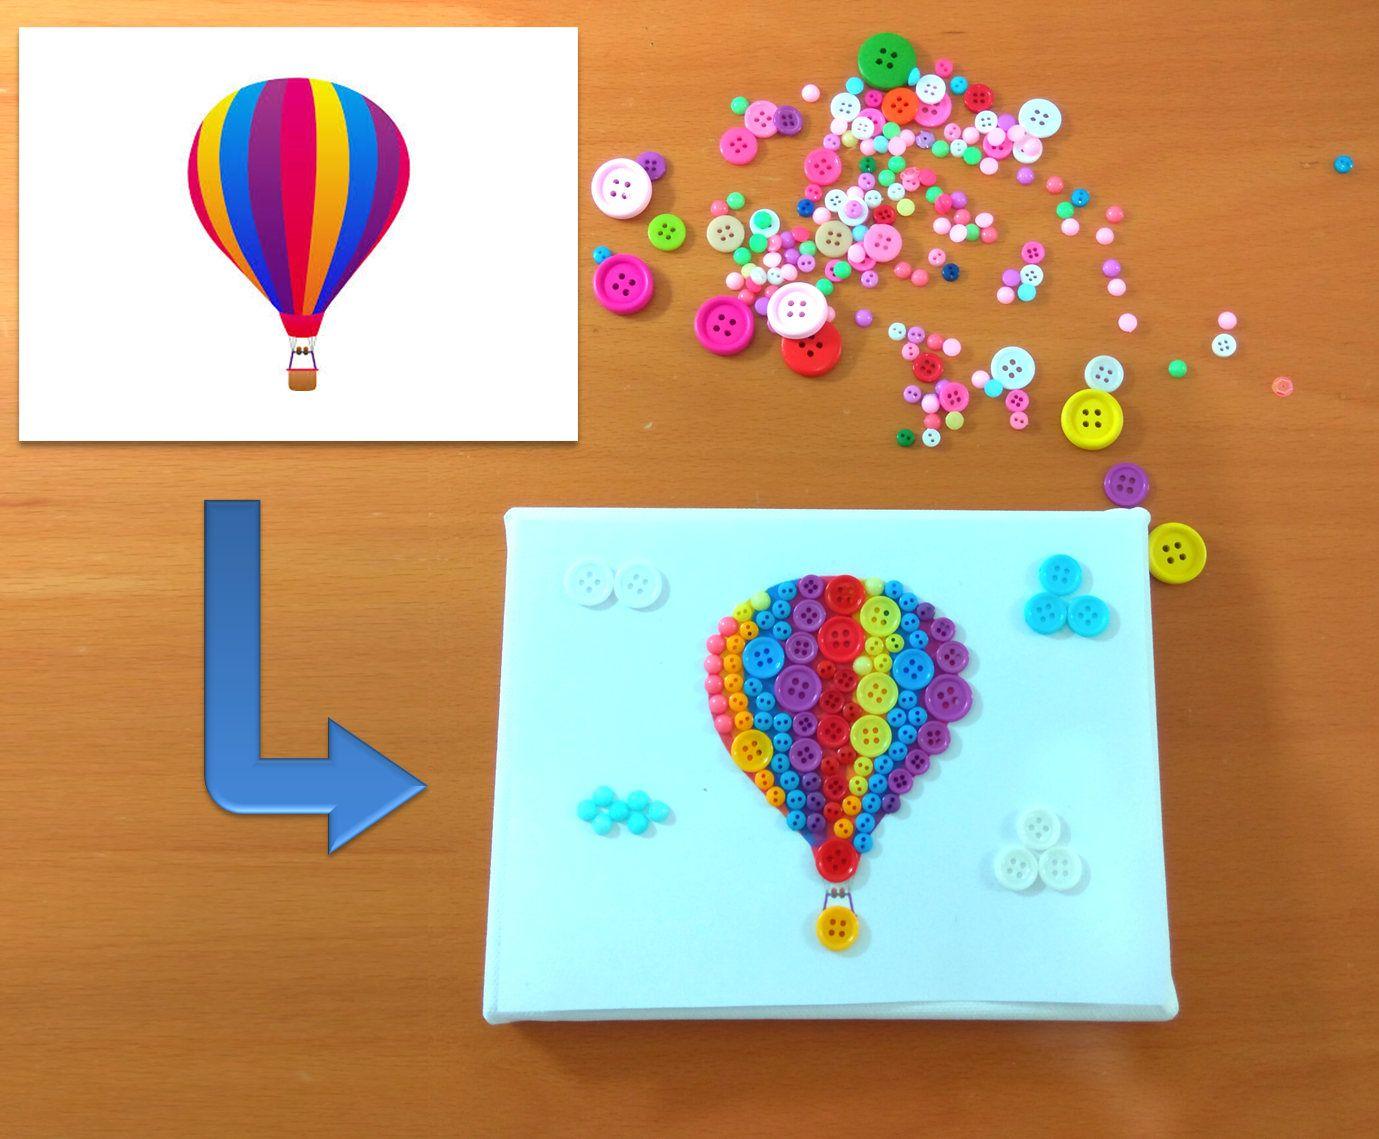 Diy button art kit for kids button canvas craft kit ballon art diy button art kit for kids button canvas craft kit ballon art puzzle solutioingenieria Choice Image